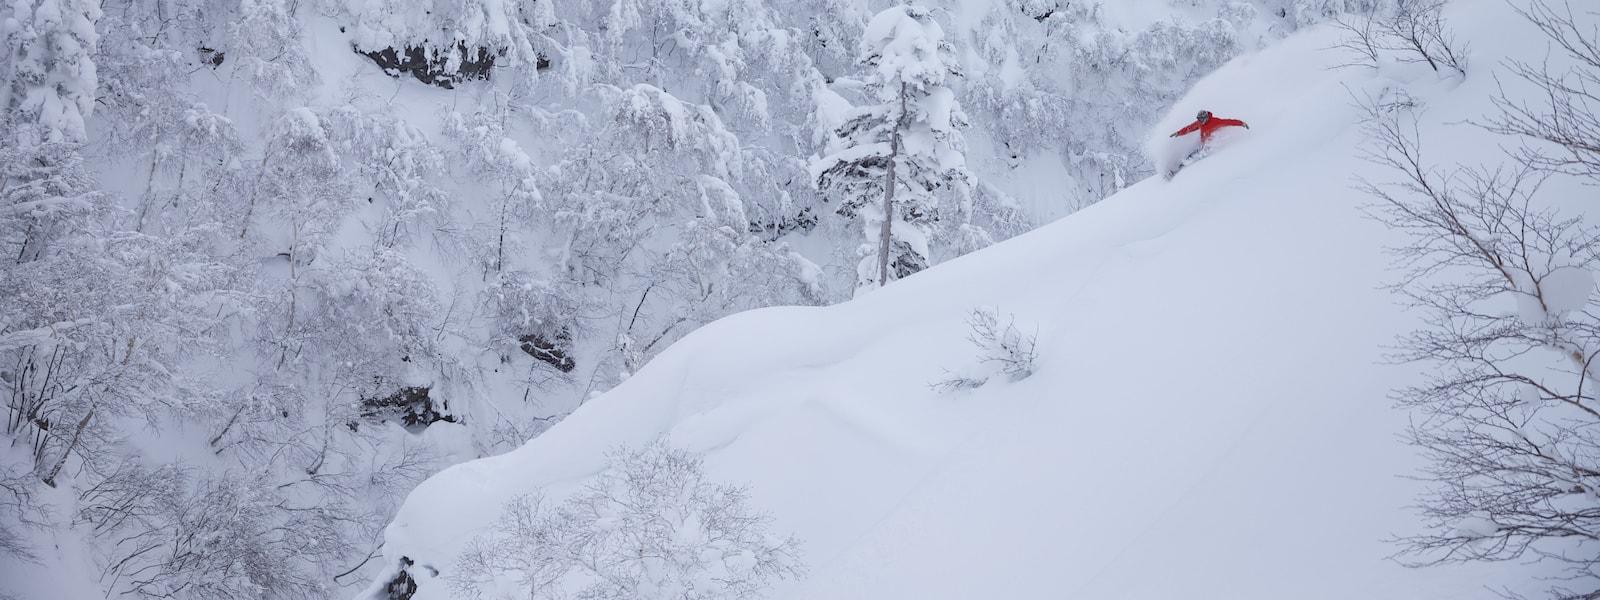 hakuba snowboarding epic pass japan (p.c. @Welsh)